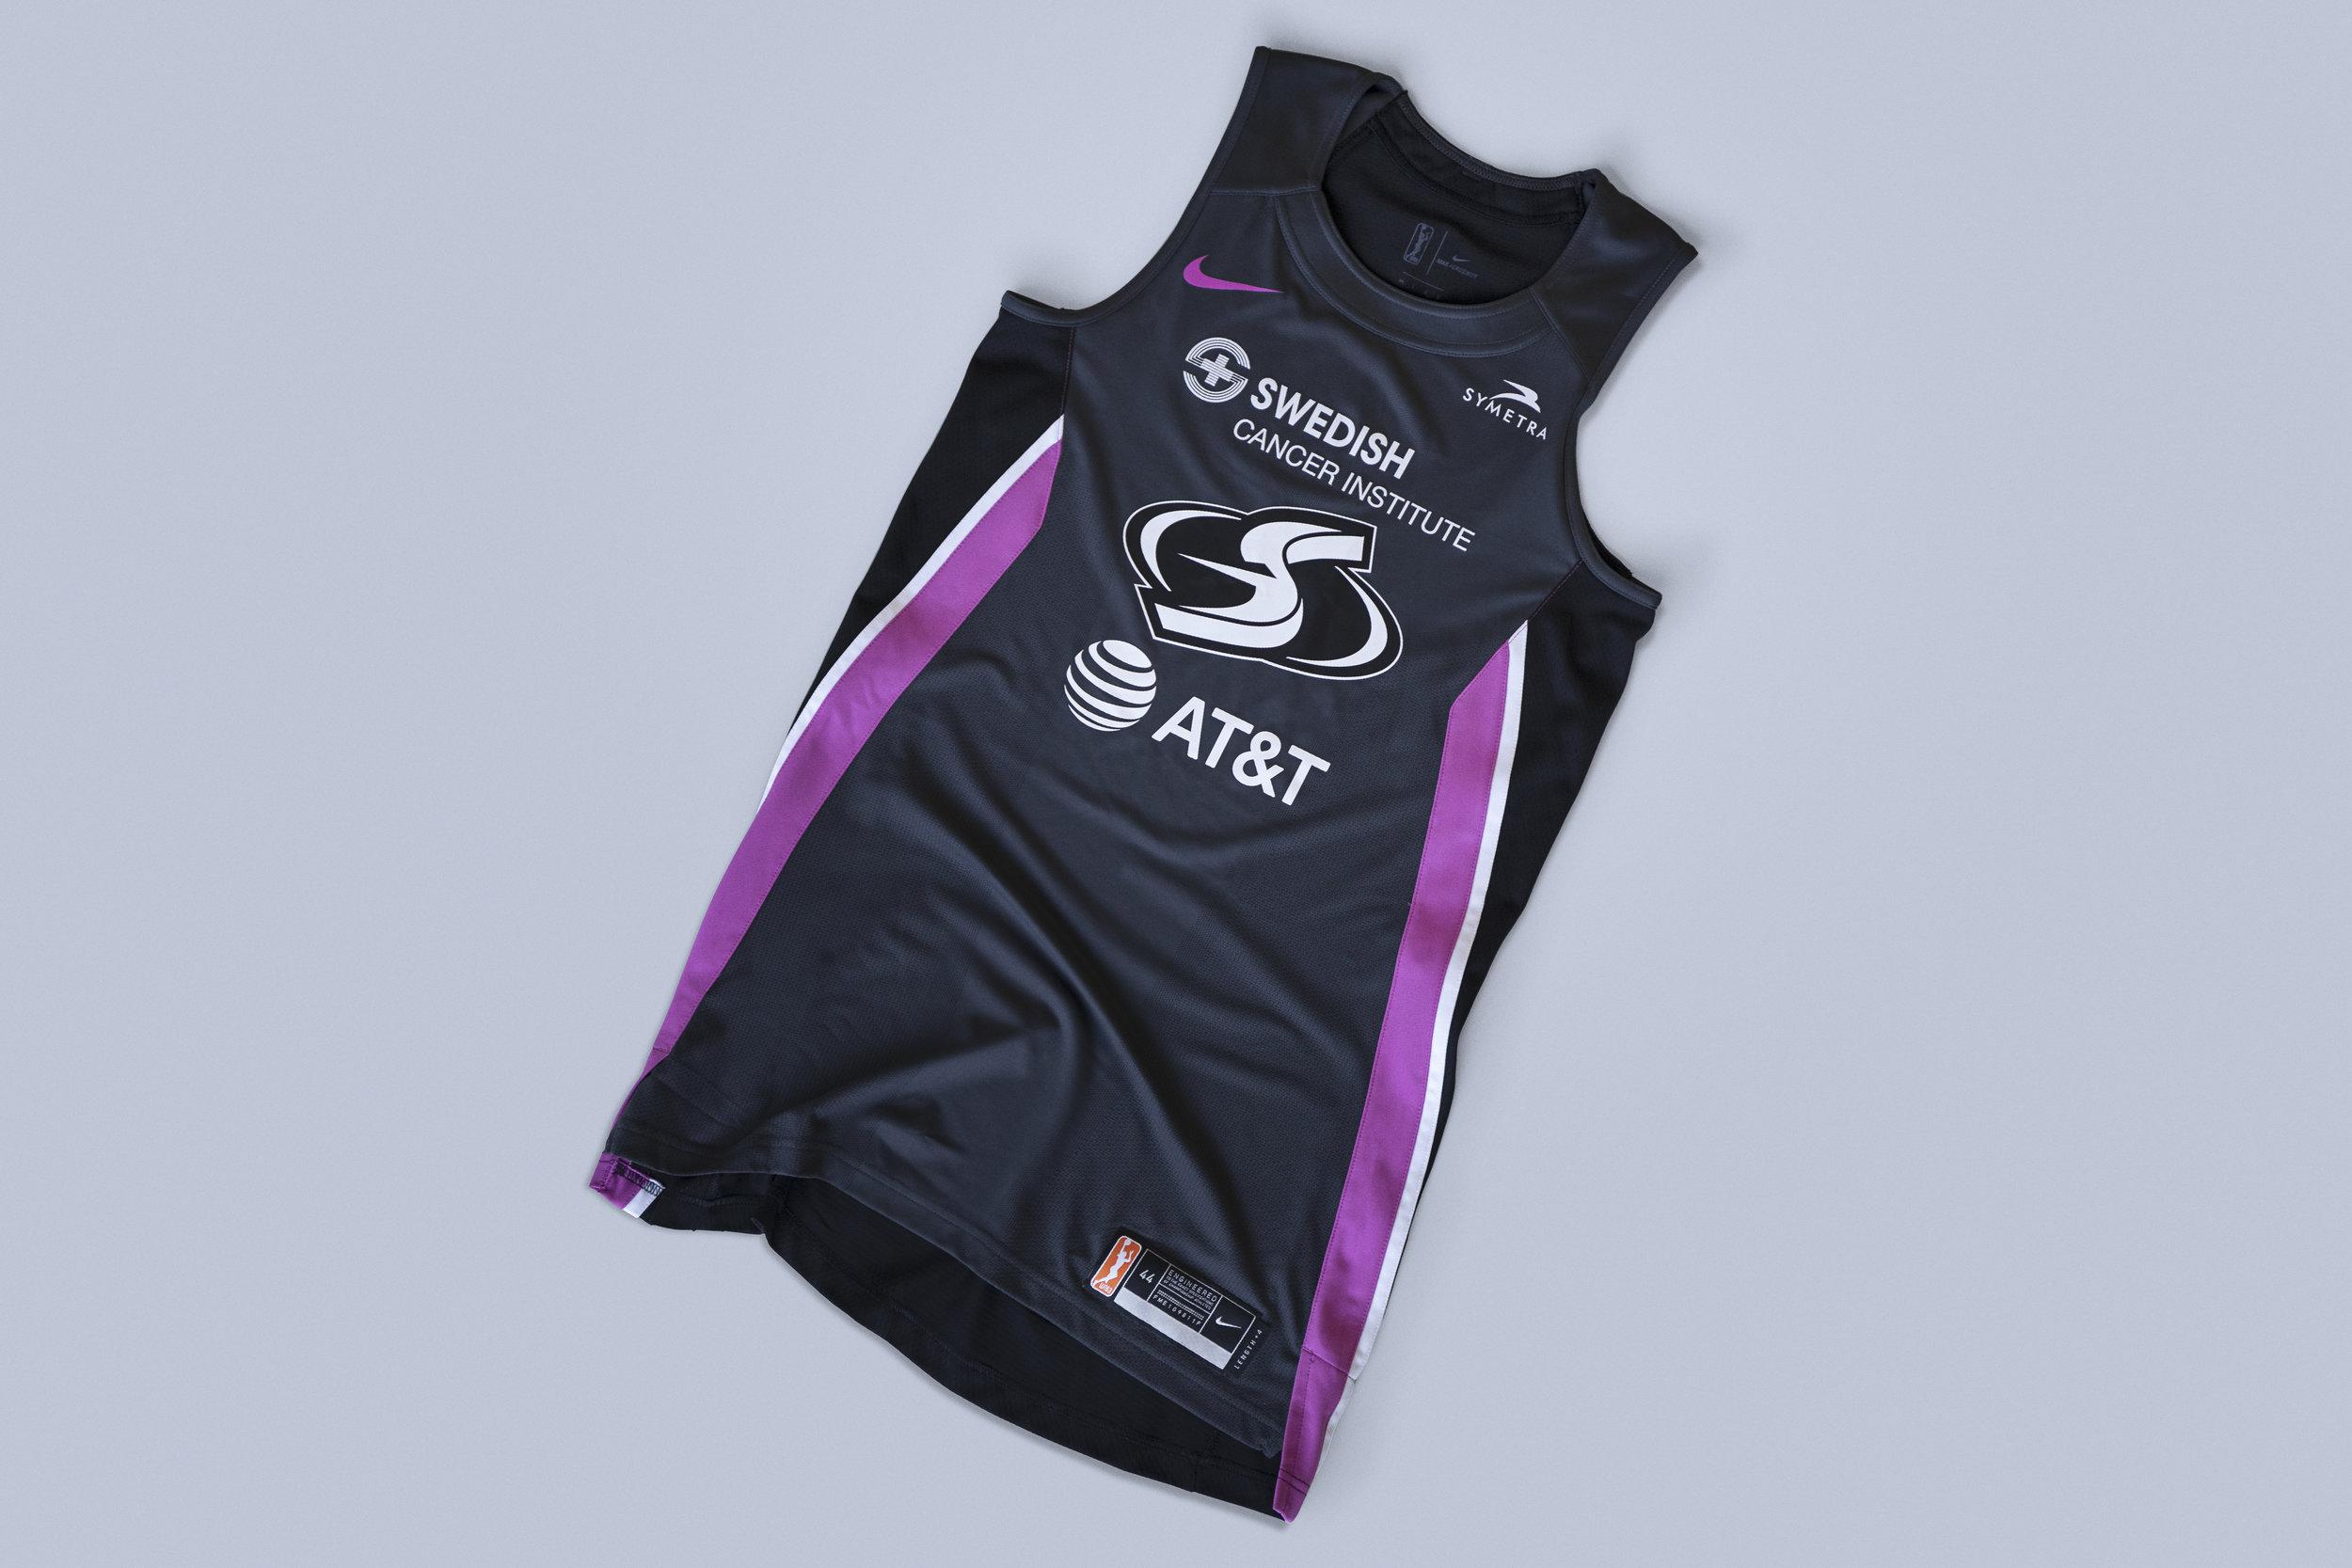 Nike_WNBA_Uniforms2019_BHA_SeattleStorm_IMG_9017_original.jpg